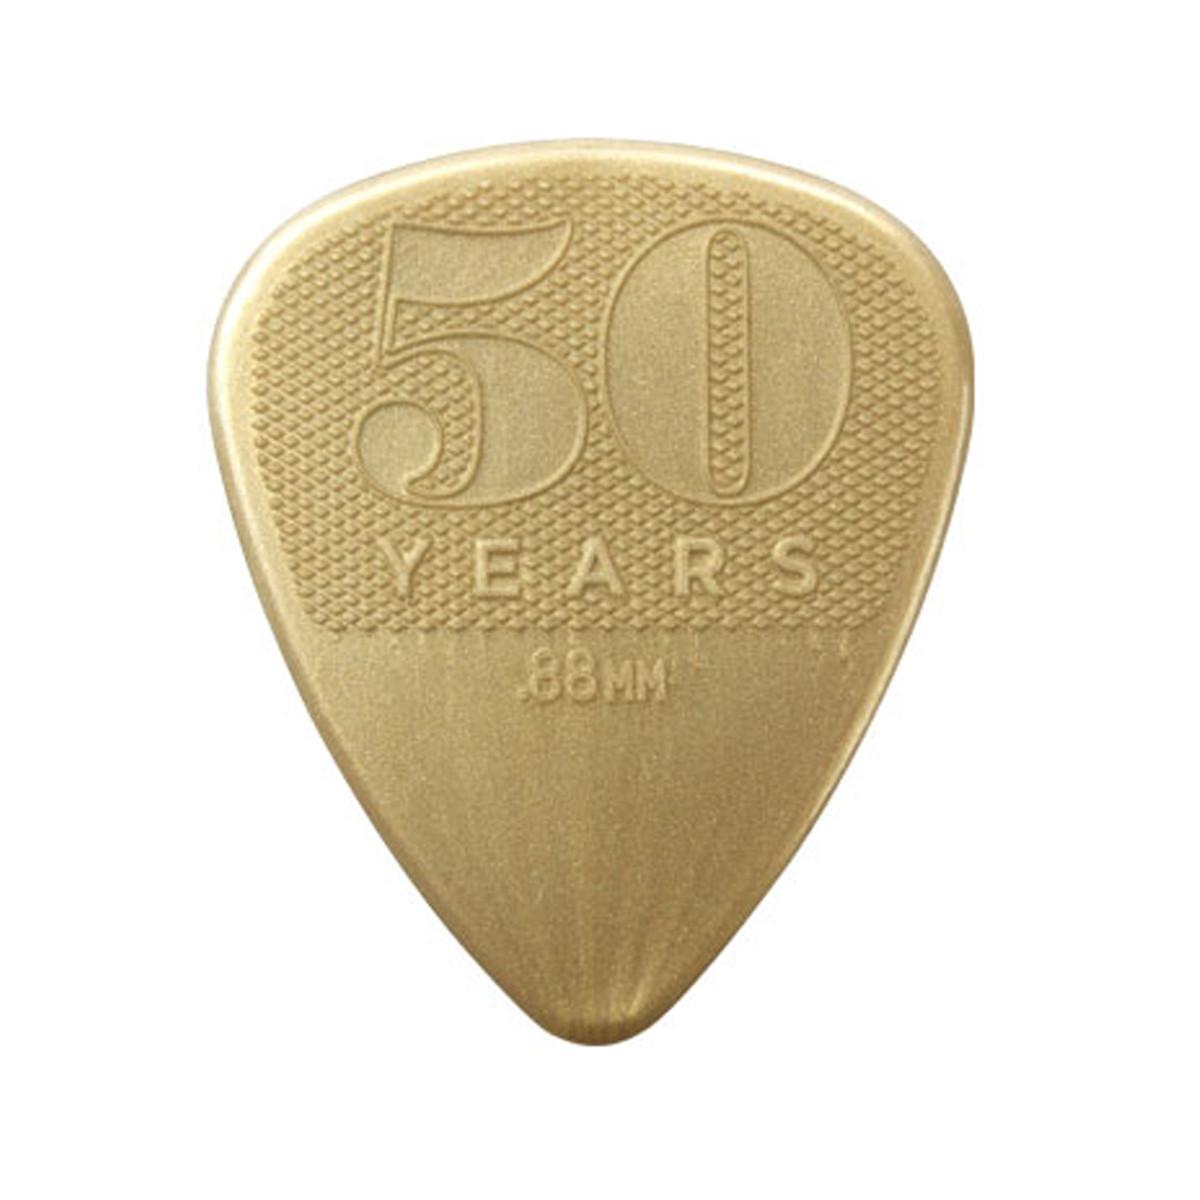 Image of Dunlop 50th Anniversary Gold Nylon Picks 0.88mm